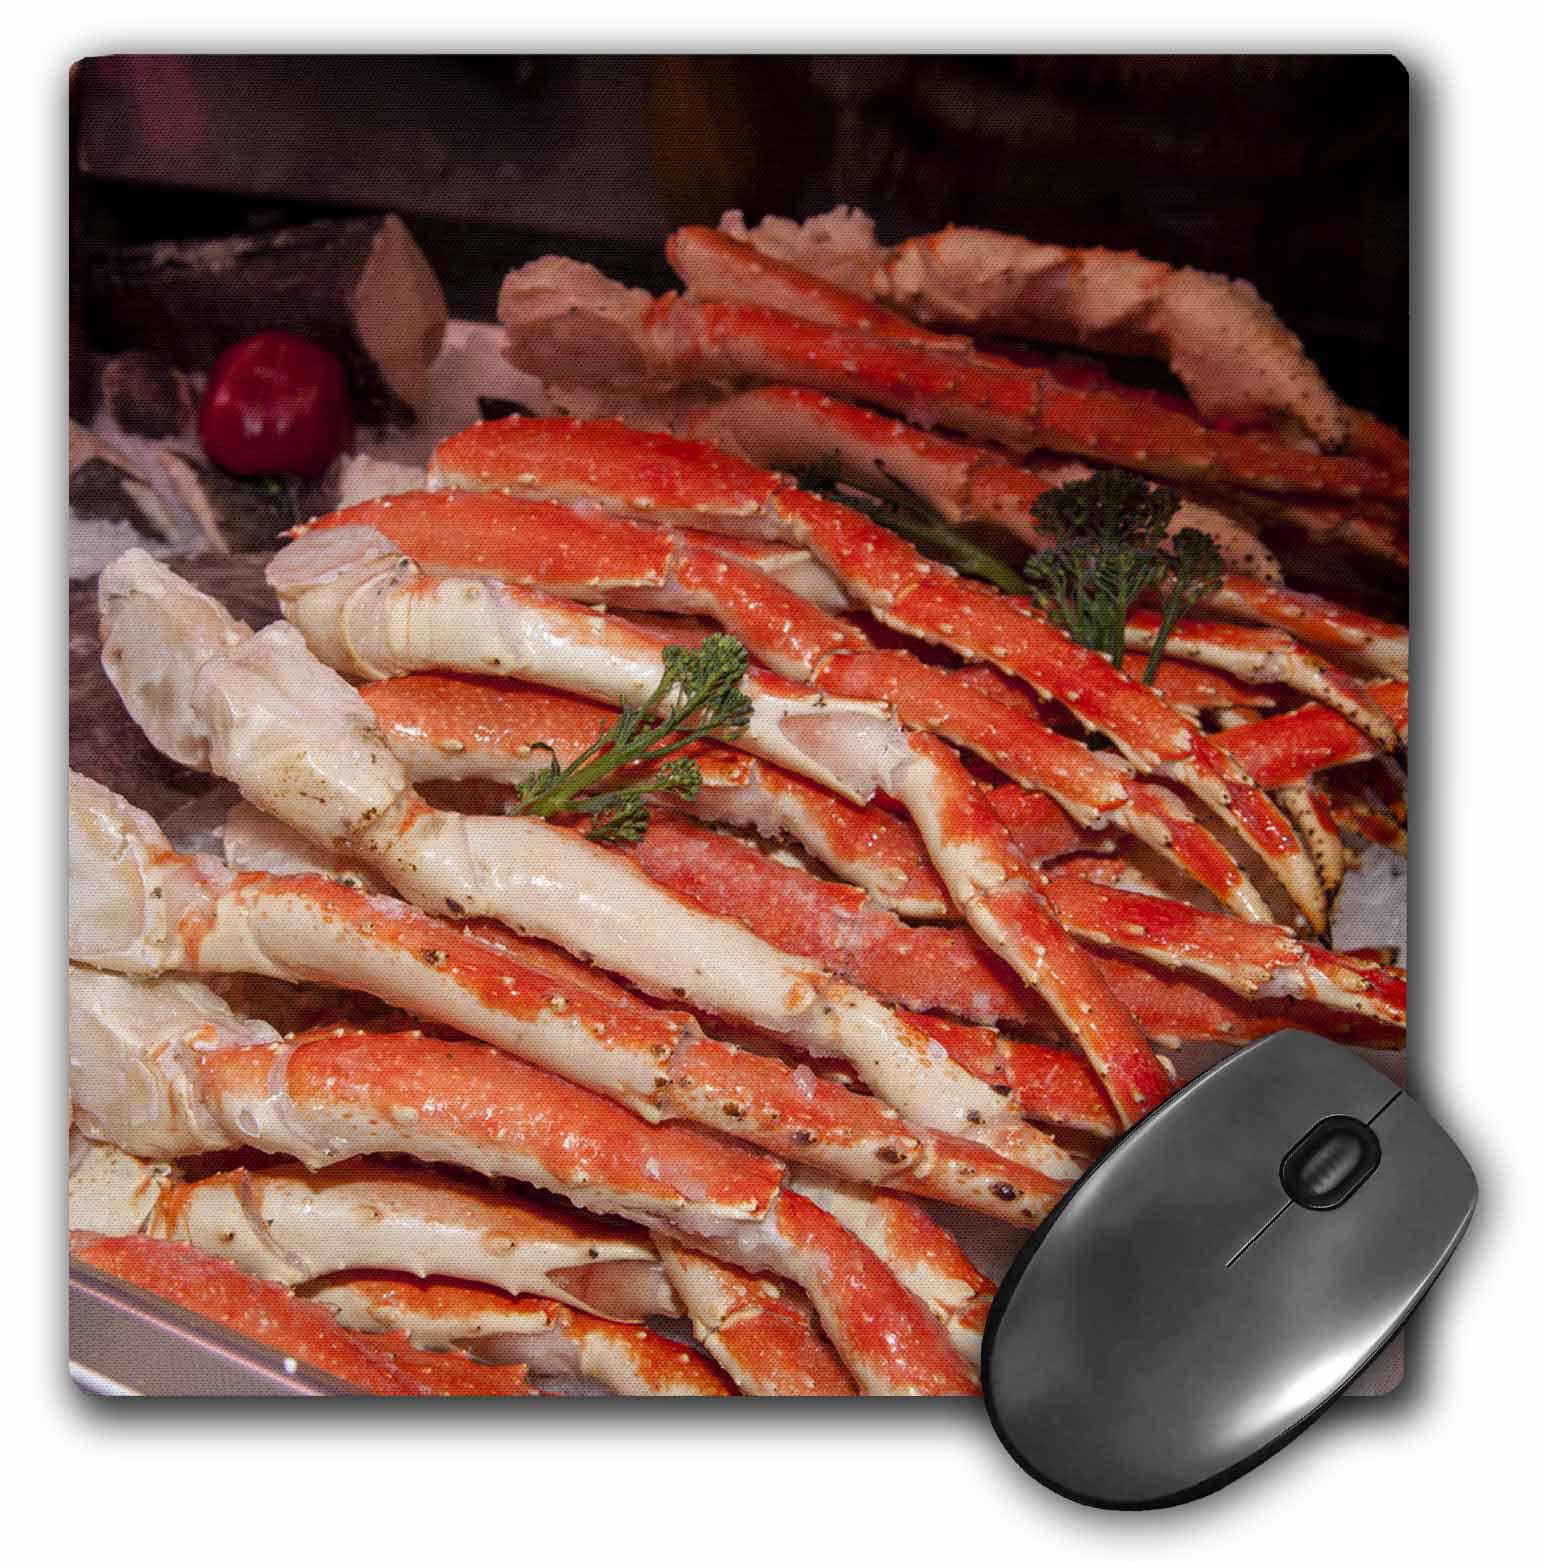 3dRose USA, Massachusetts, Boston, Market King crab legs - US22 JEN0084 - Jim Engelbrecht, Mouse Pad, 8 by 8 inches